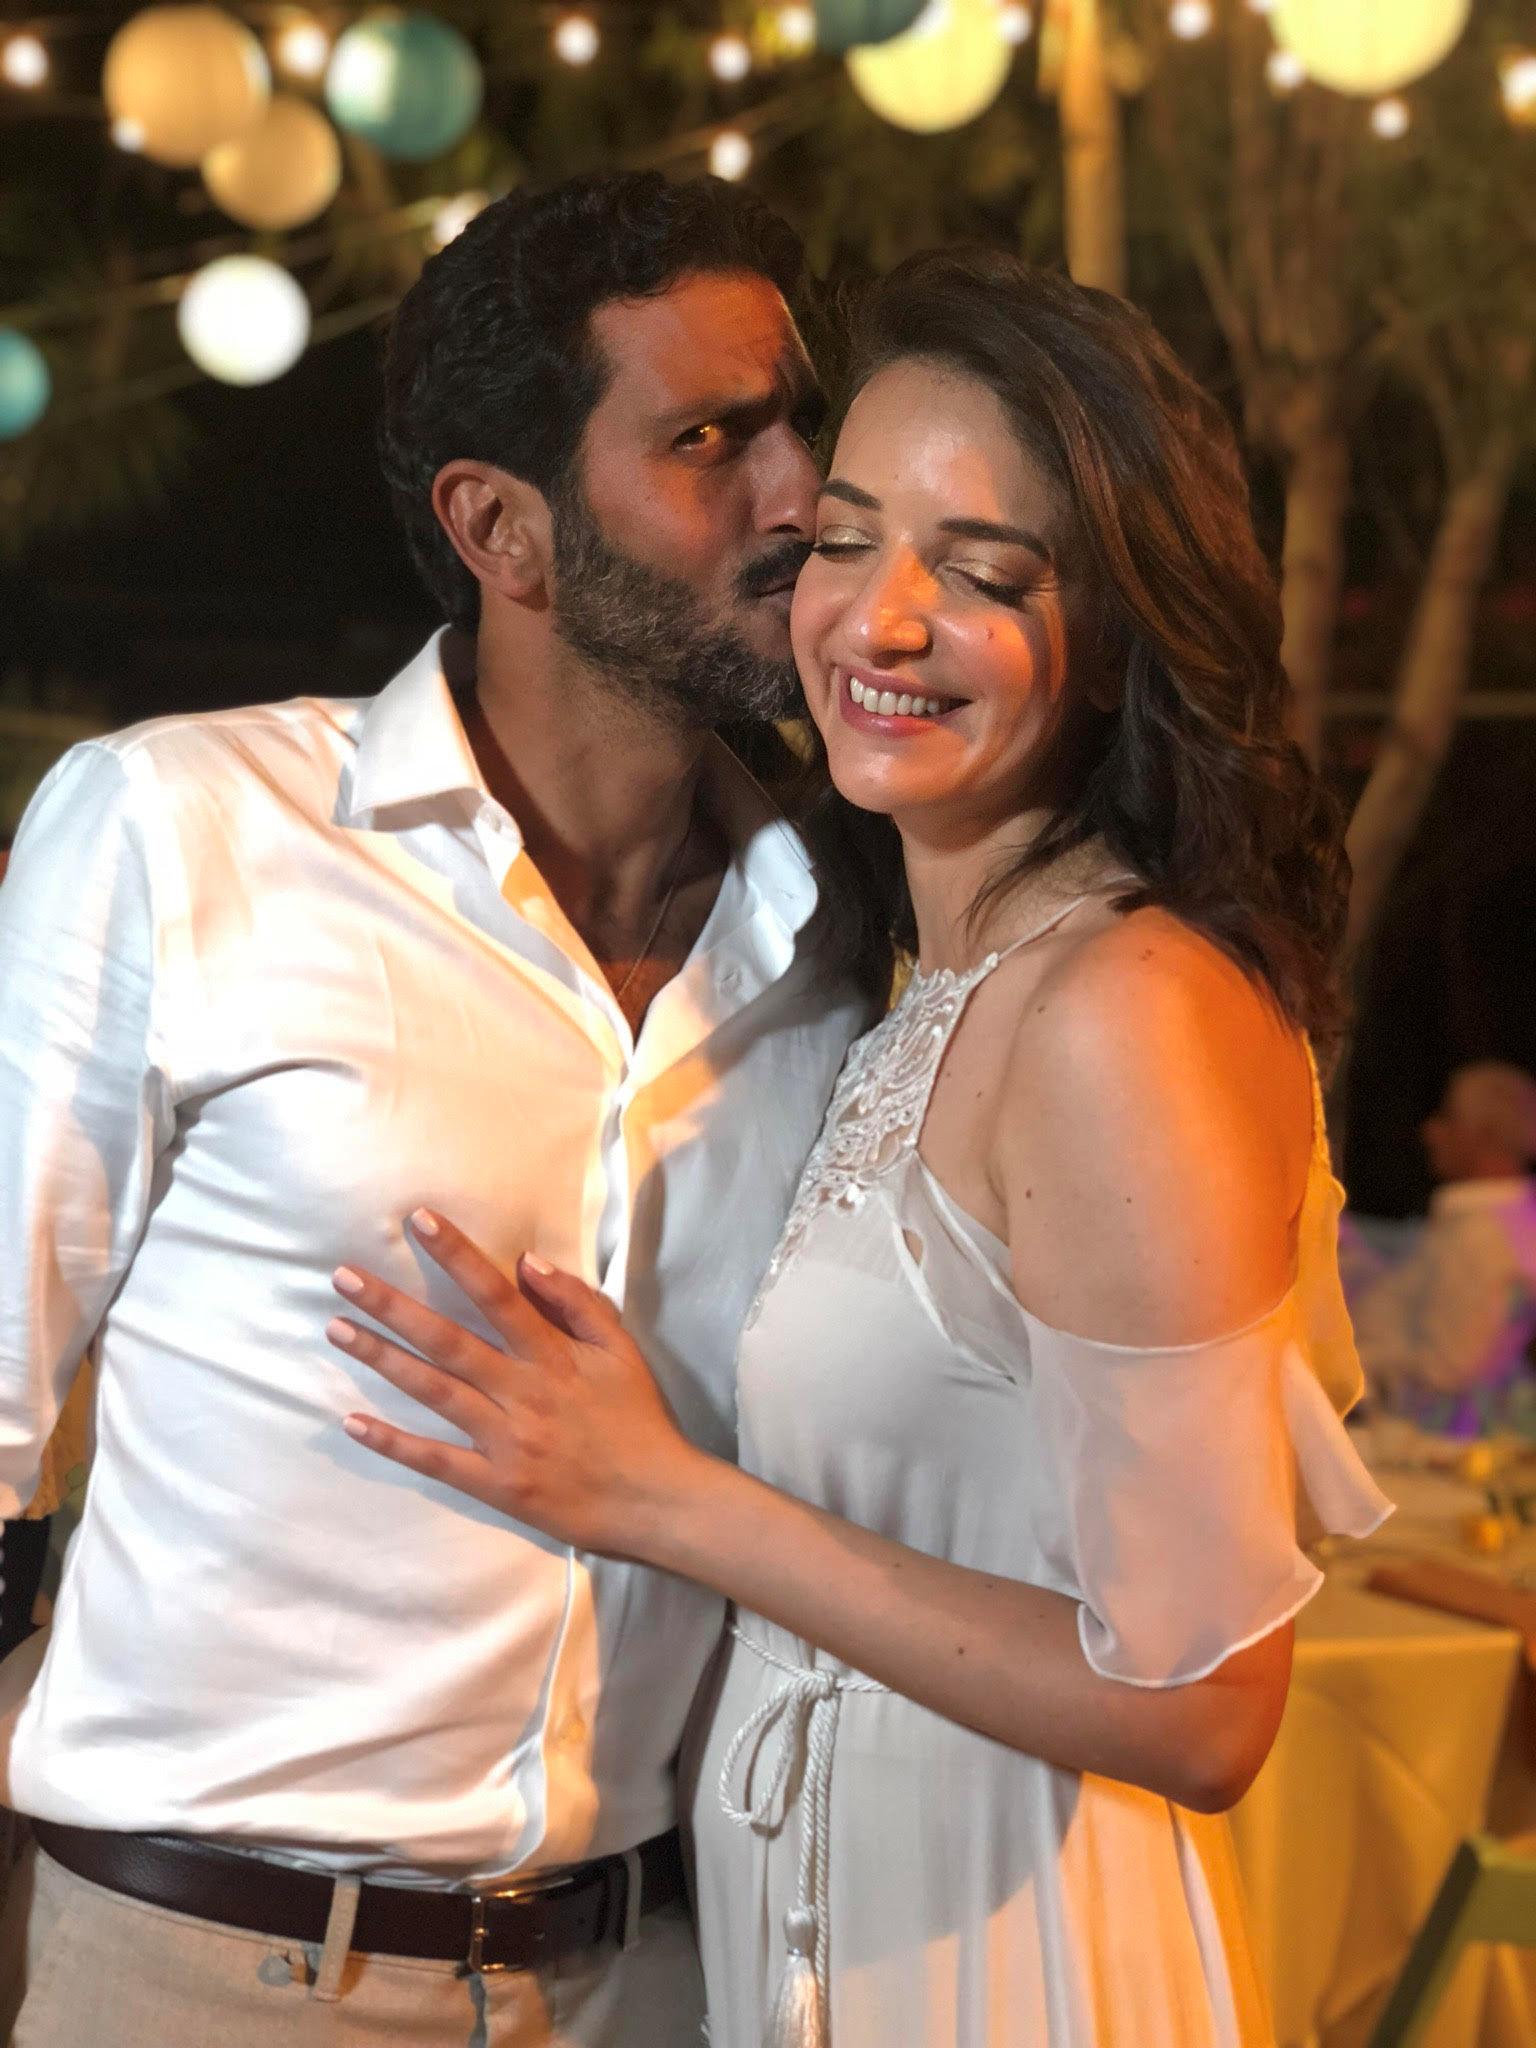 Celebrity Jewish-Arab wedding stirs mixed feelings in Israel